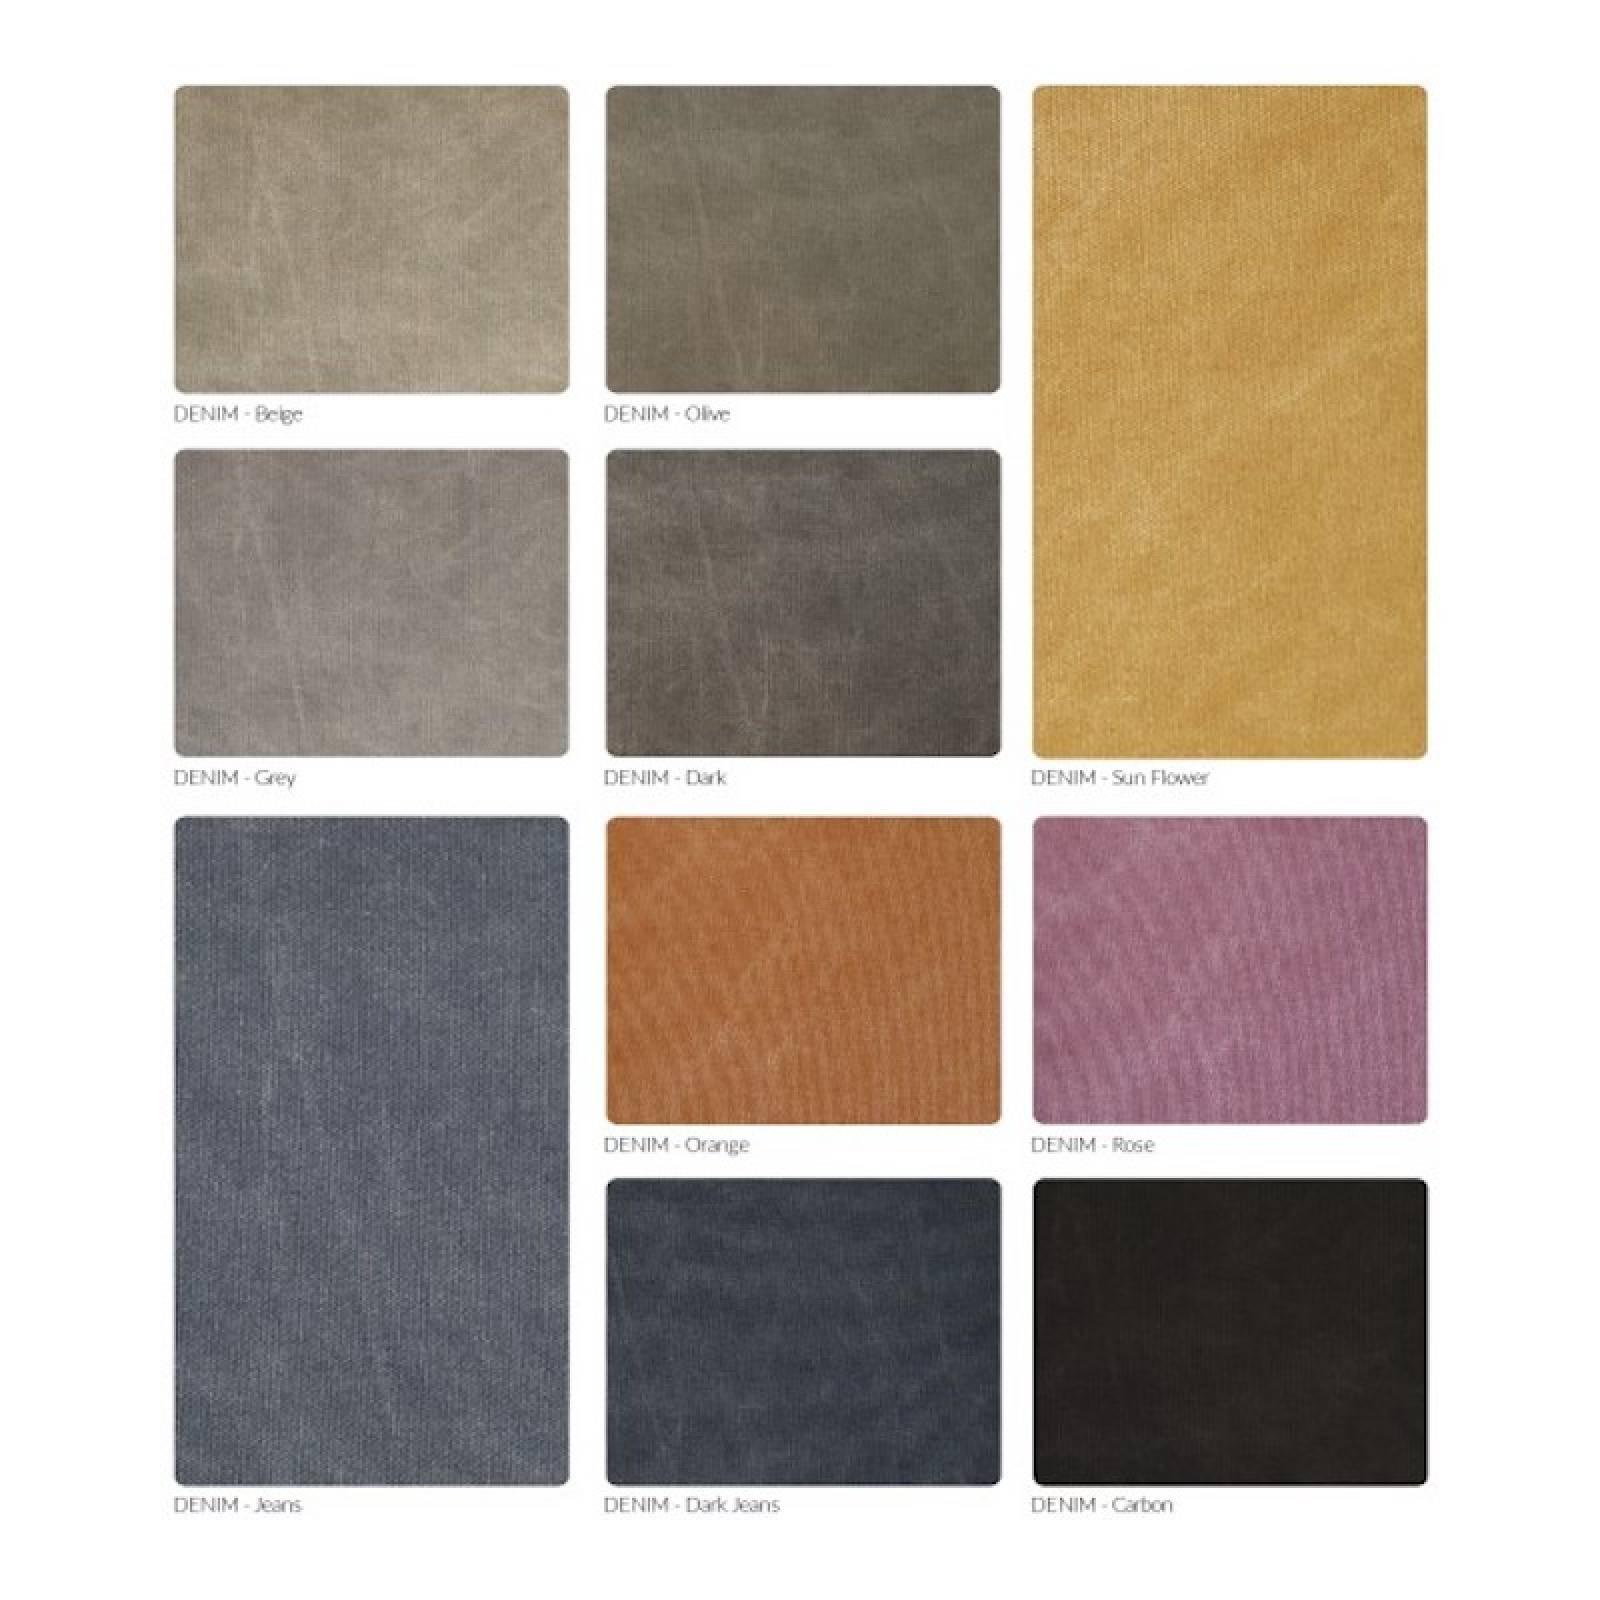 366 Plus Armchair - Denim Fabrics thumbnails